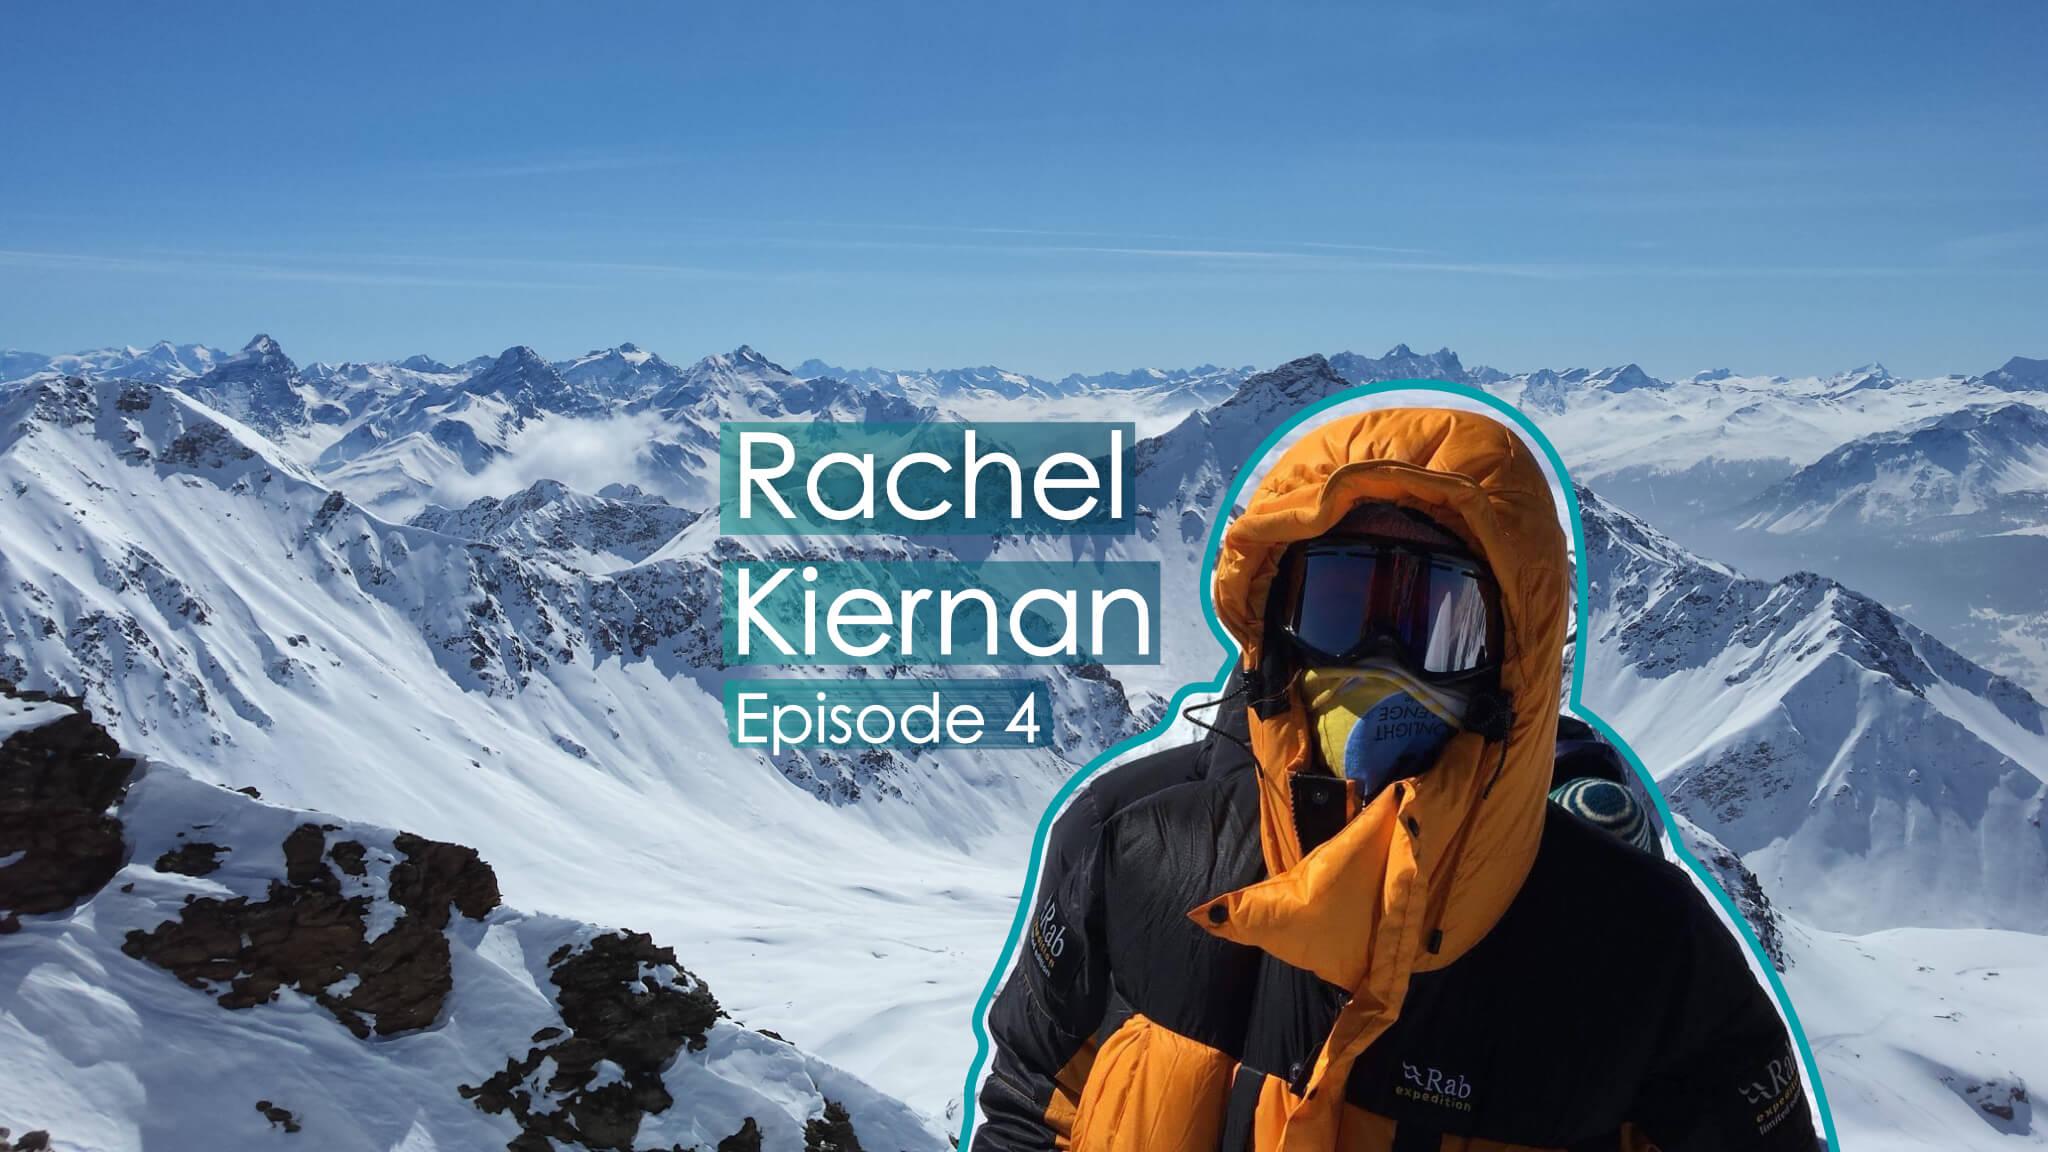 Rachel Kiernan Earth's Edge podcast